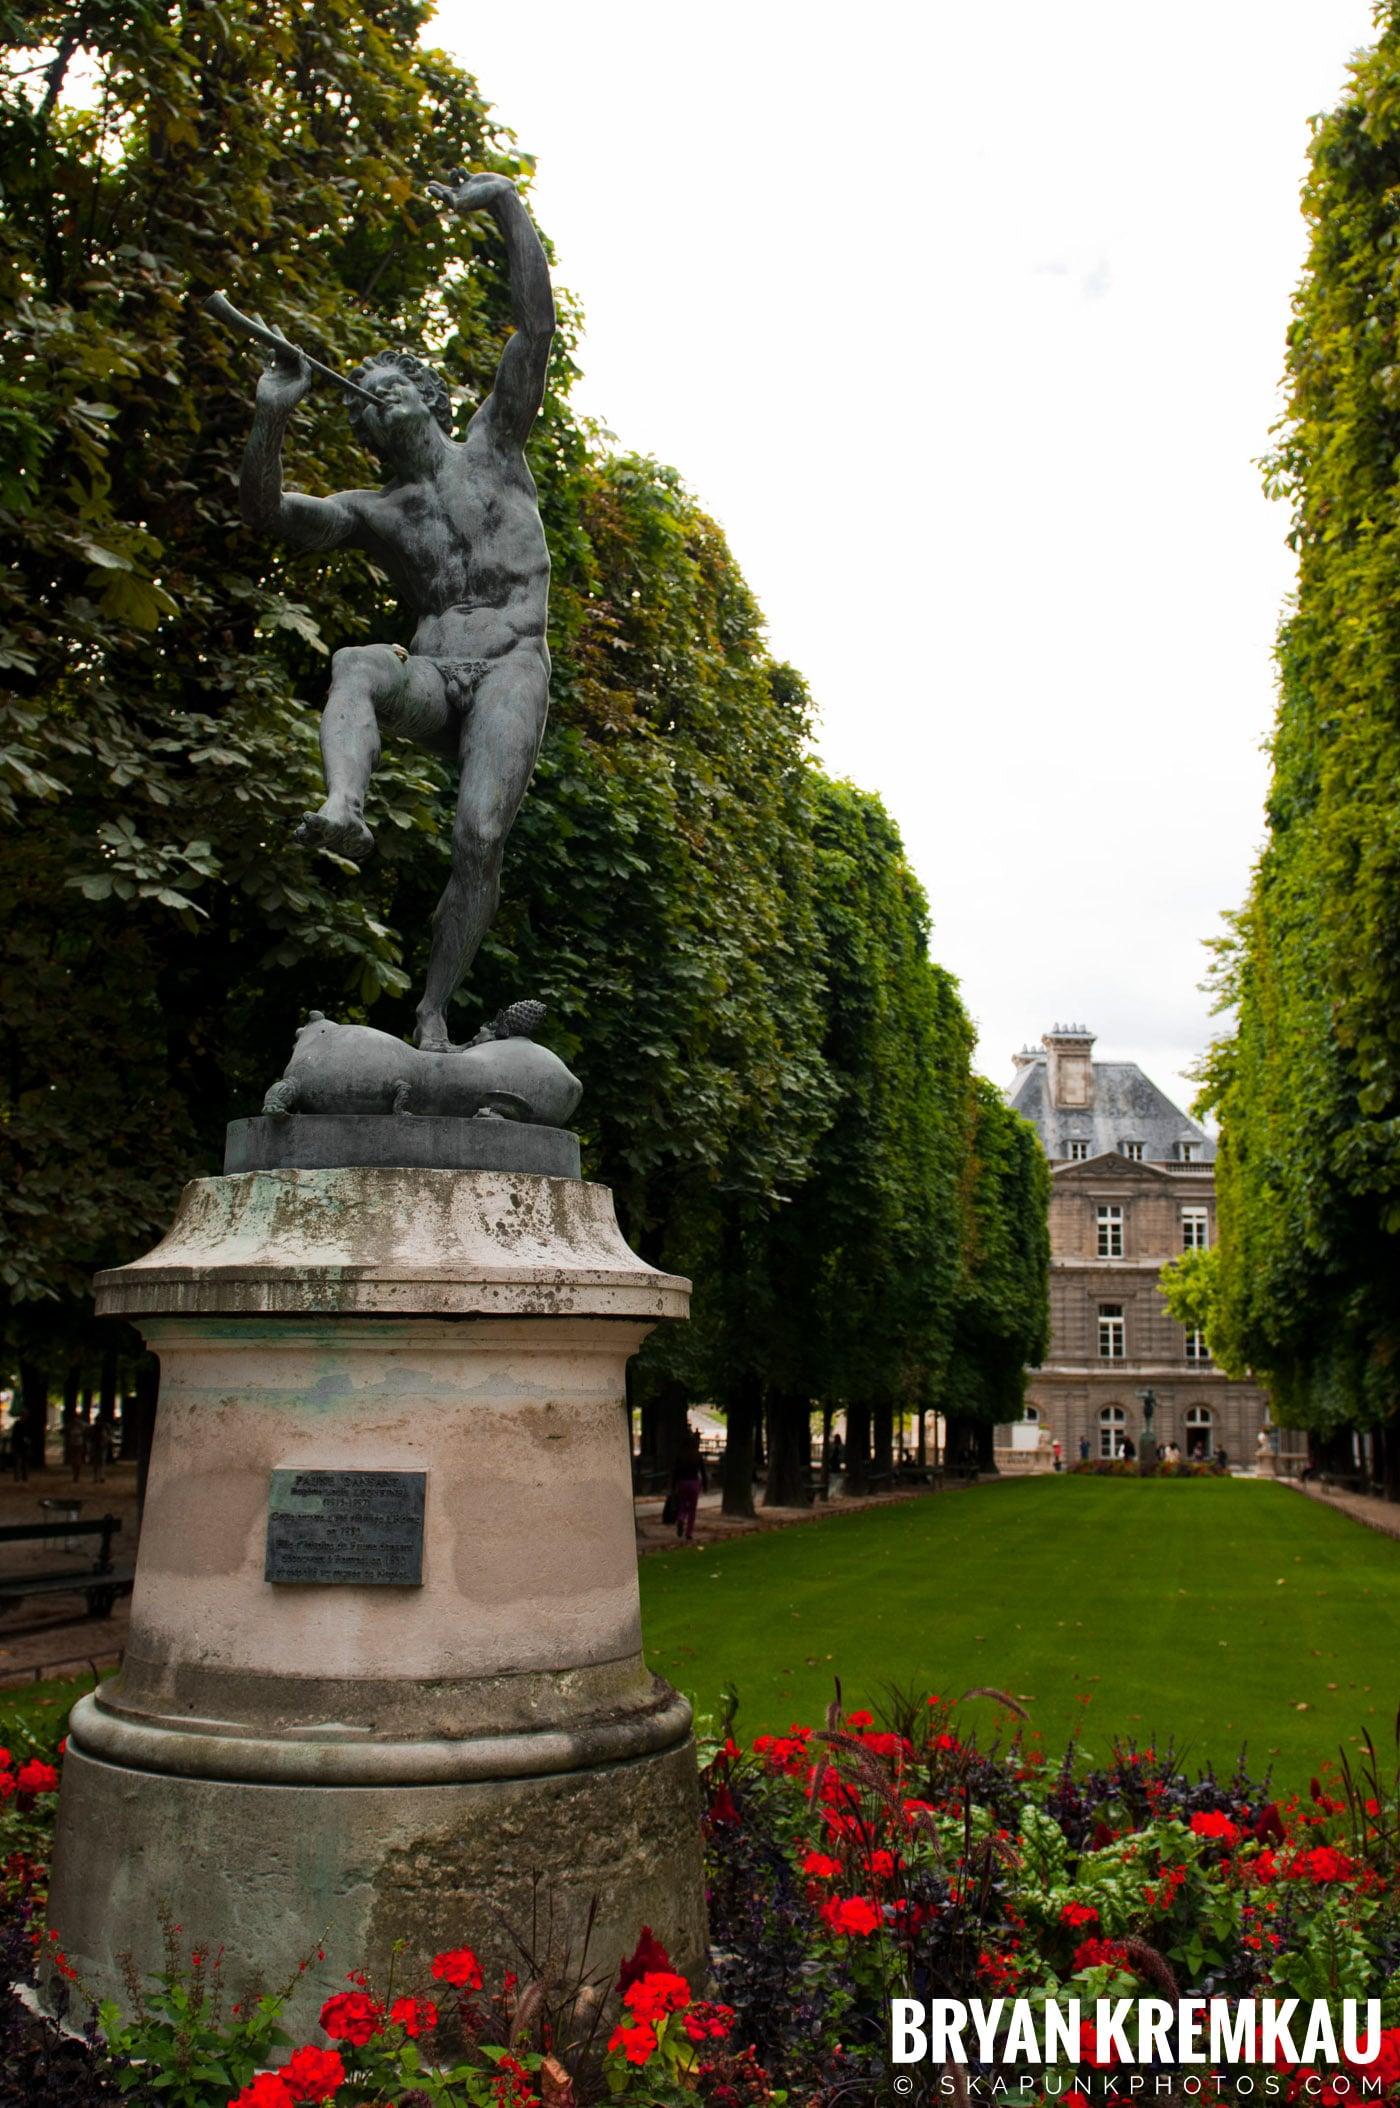 Paris, France Honeymoon - Day 1 - 7.18.11 (53)